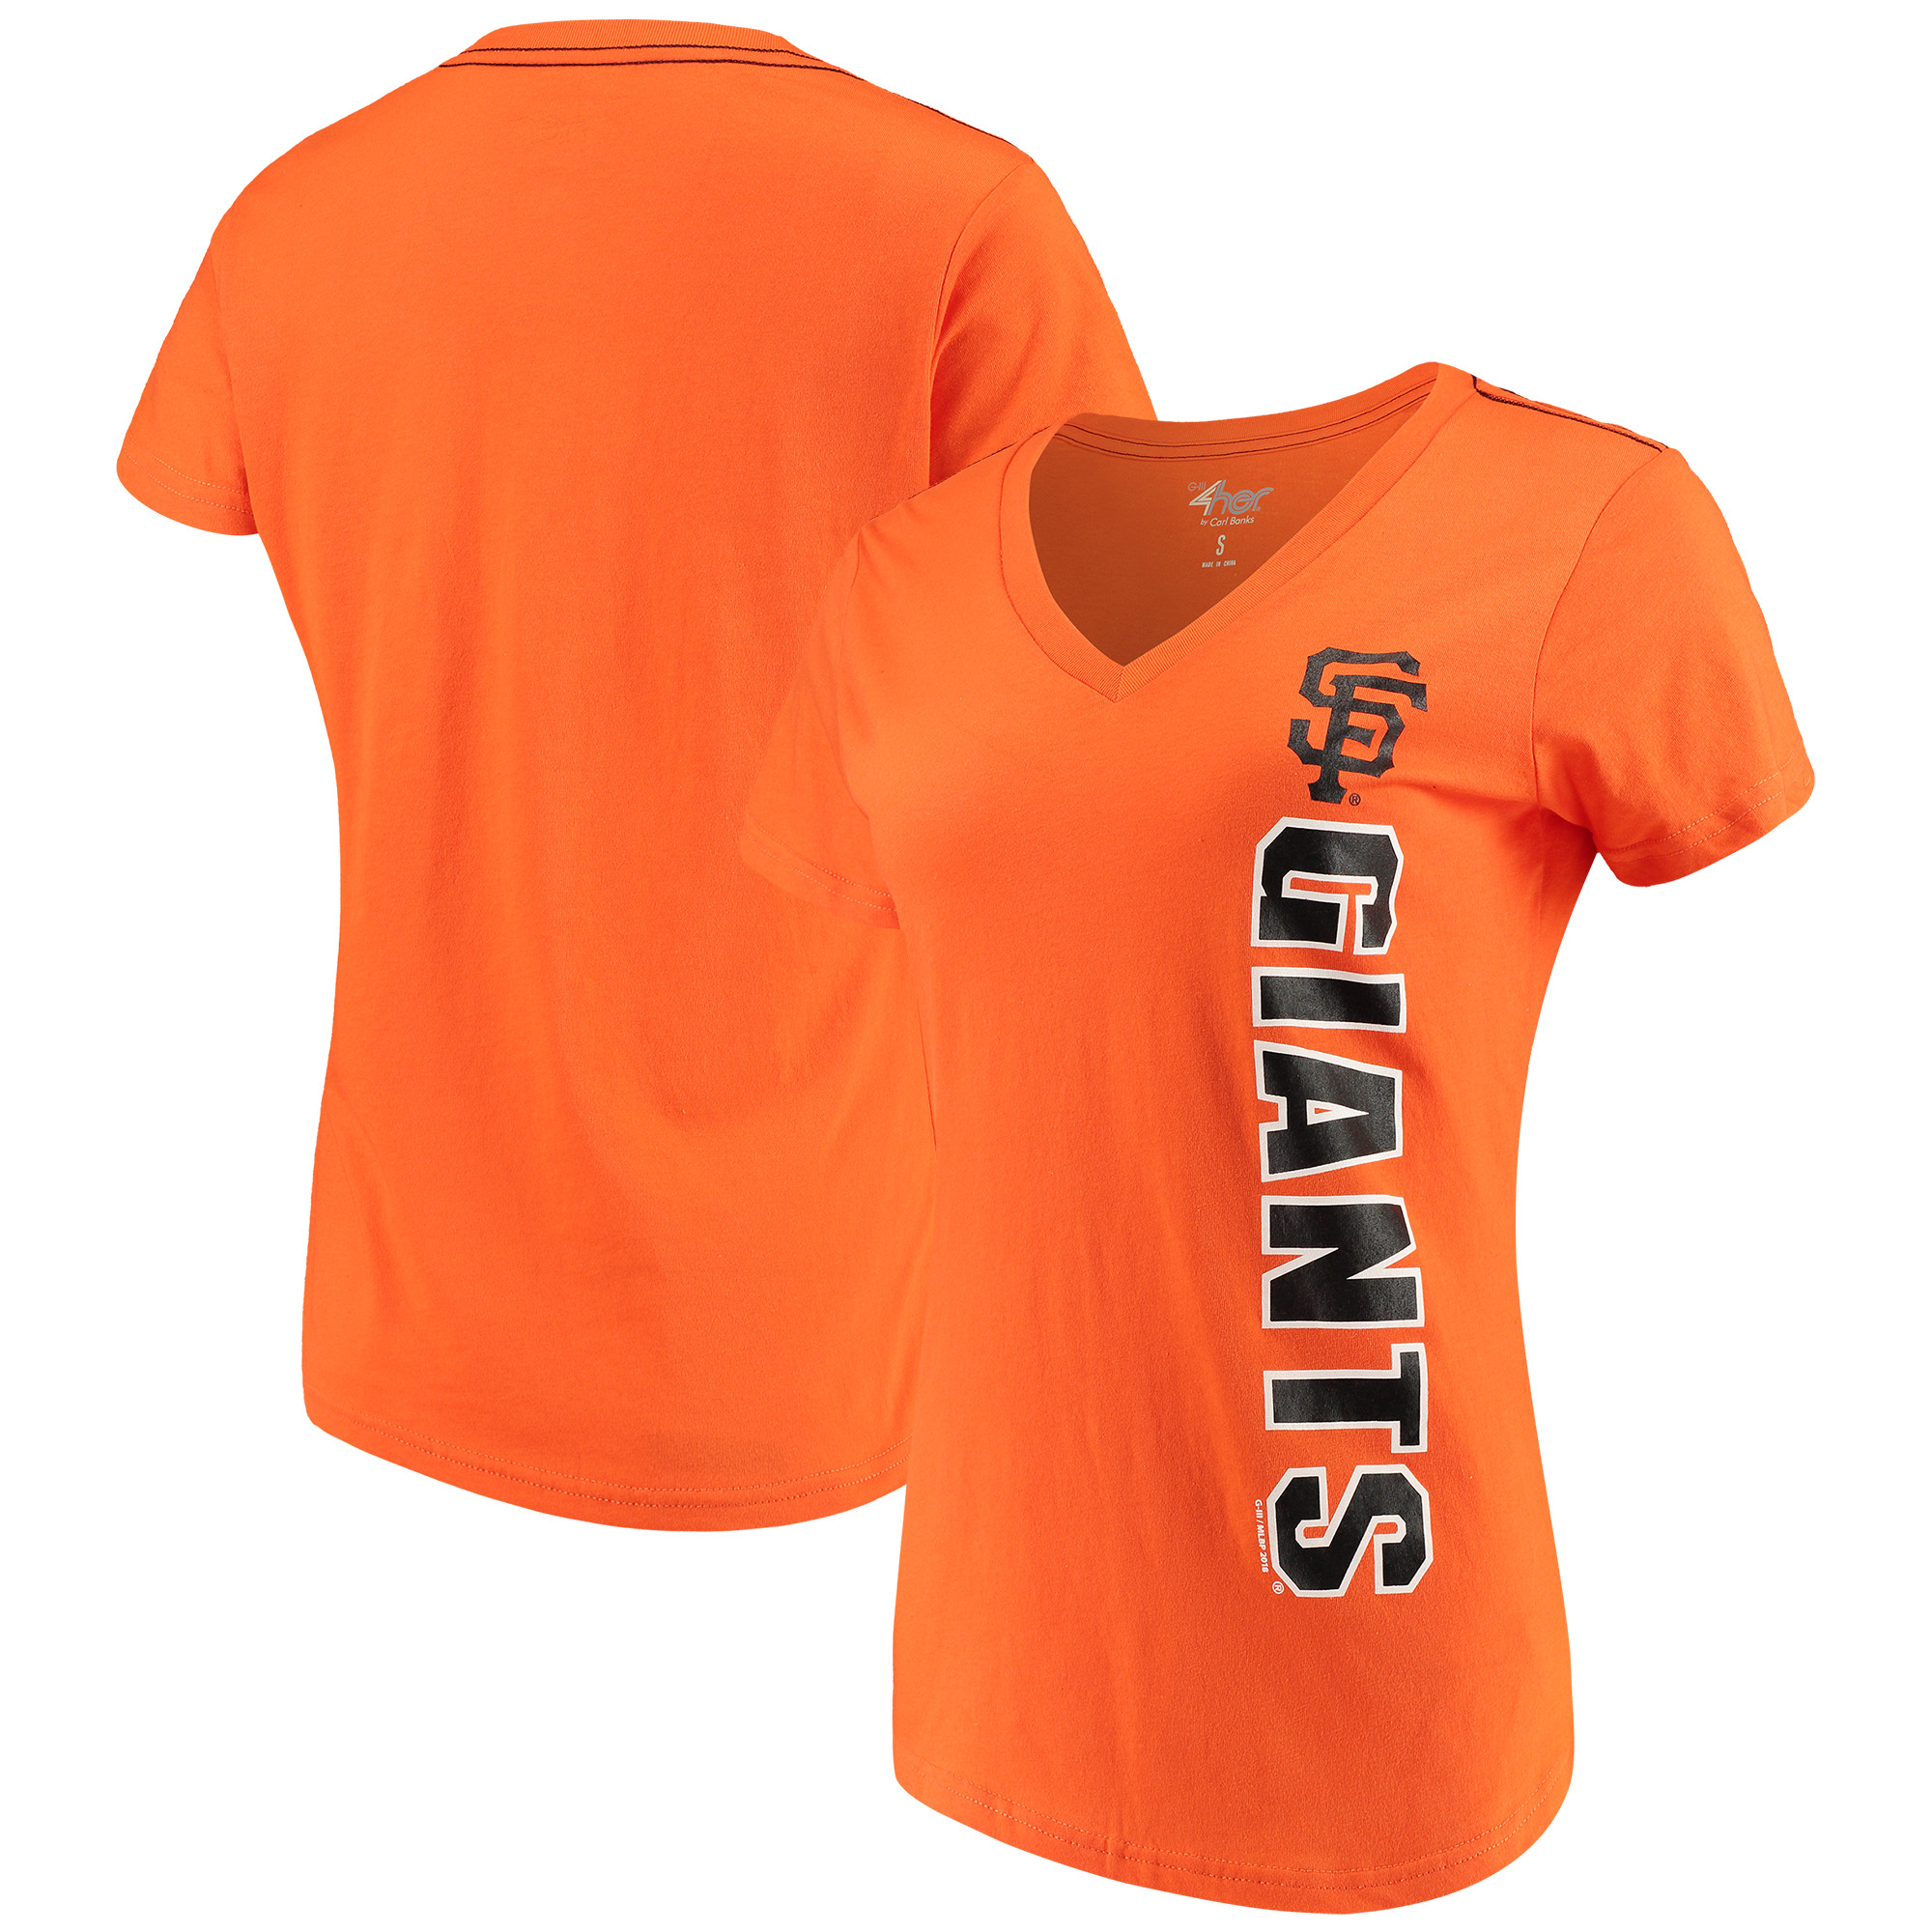 San Francisco Giants G-III 4Her by Carl Banks Women's Asterisk V-Neck T-Shirt - Orange